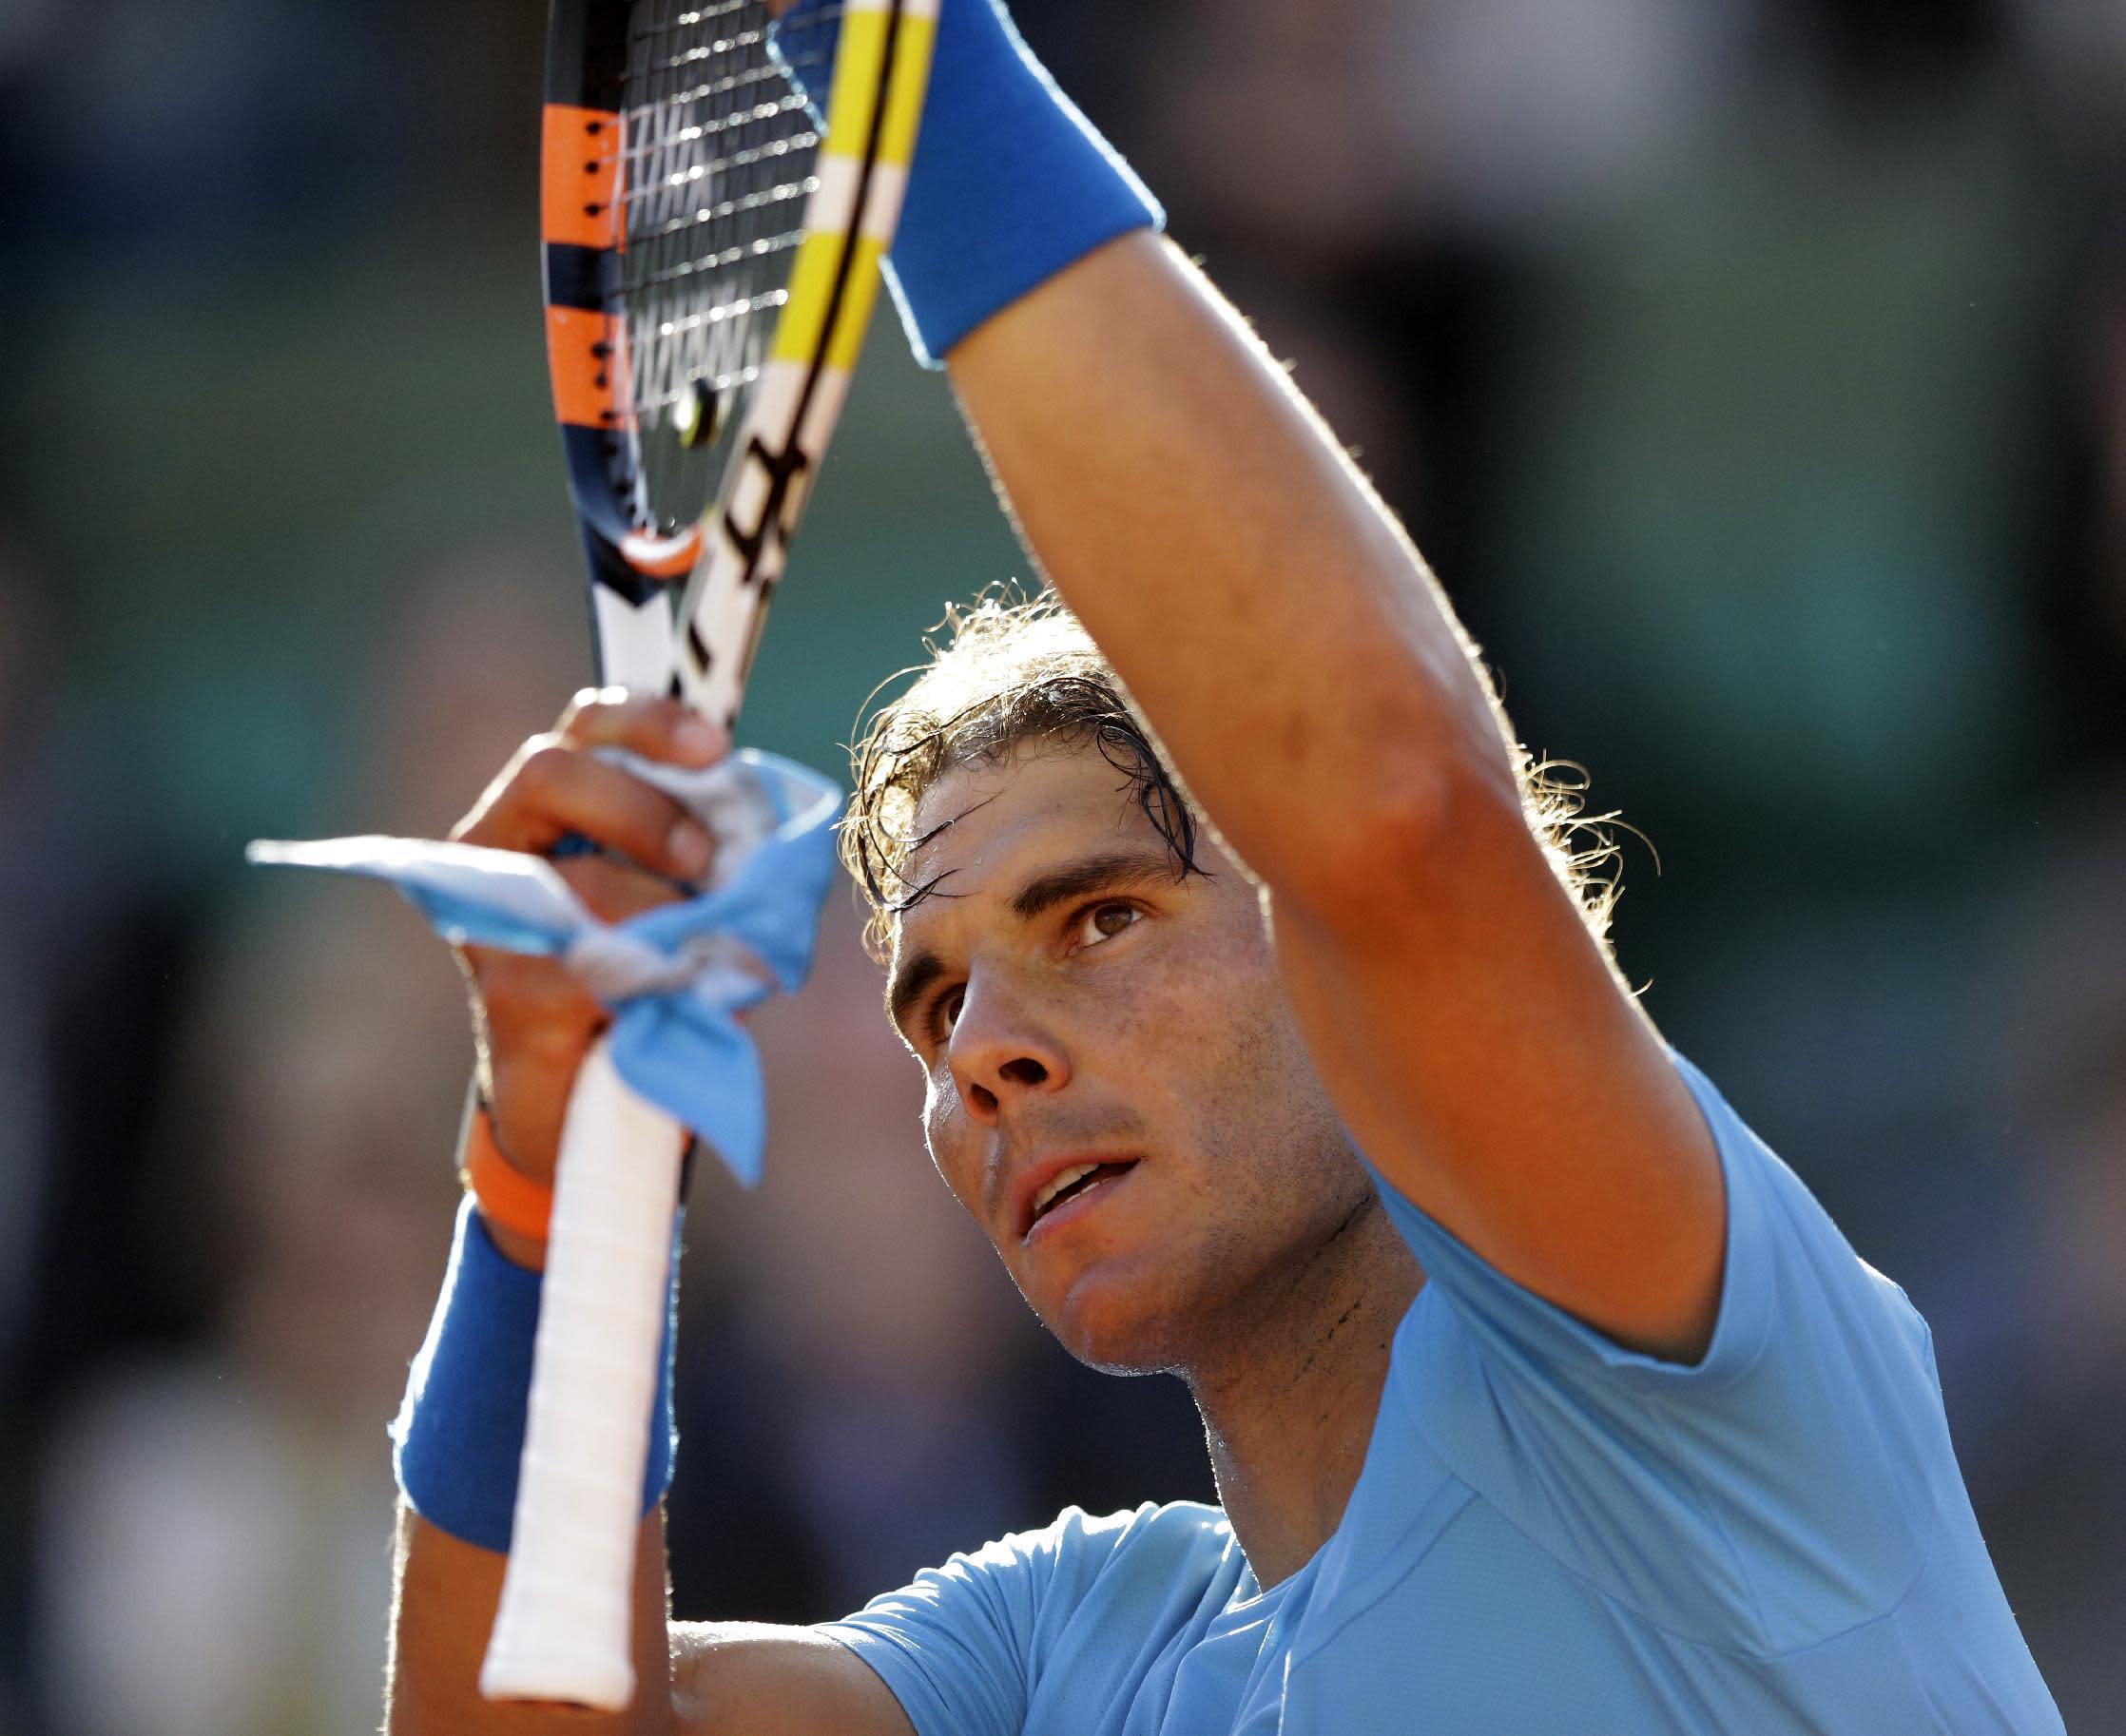 French Open Lookahead: Djokovic, Nadal renew rivalry in QF